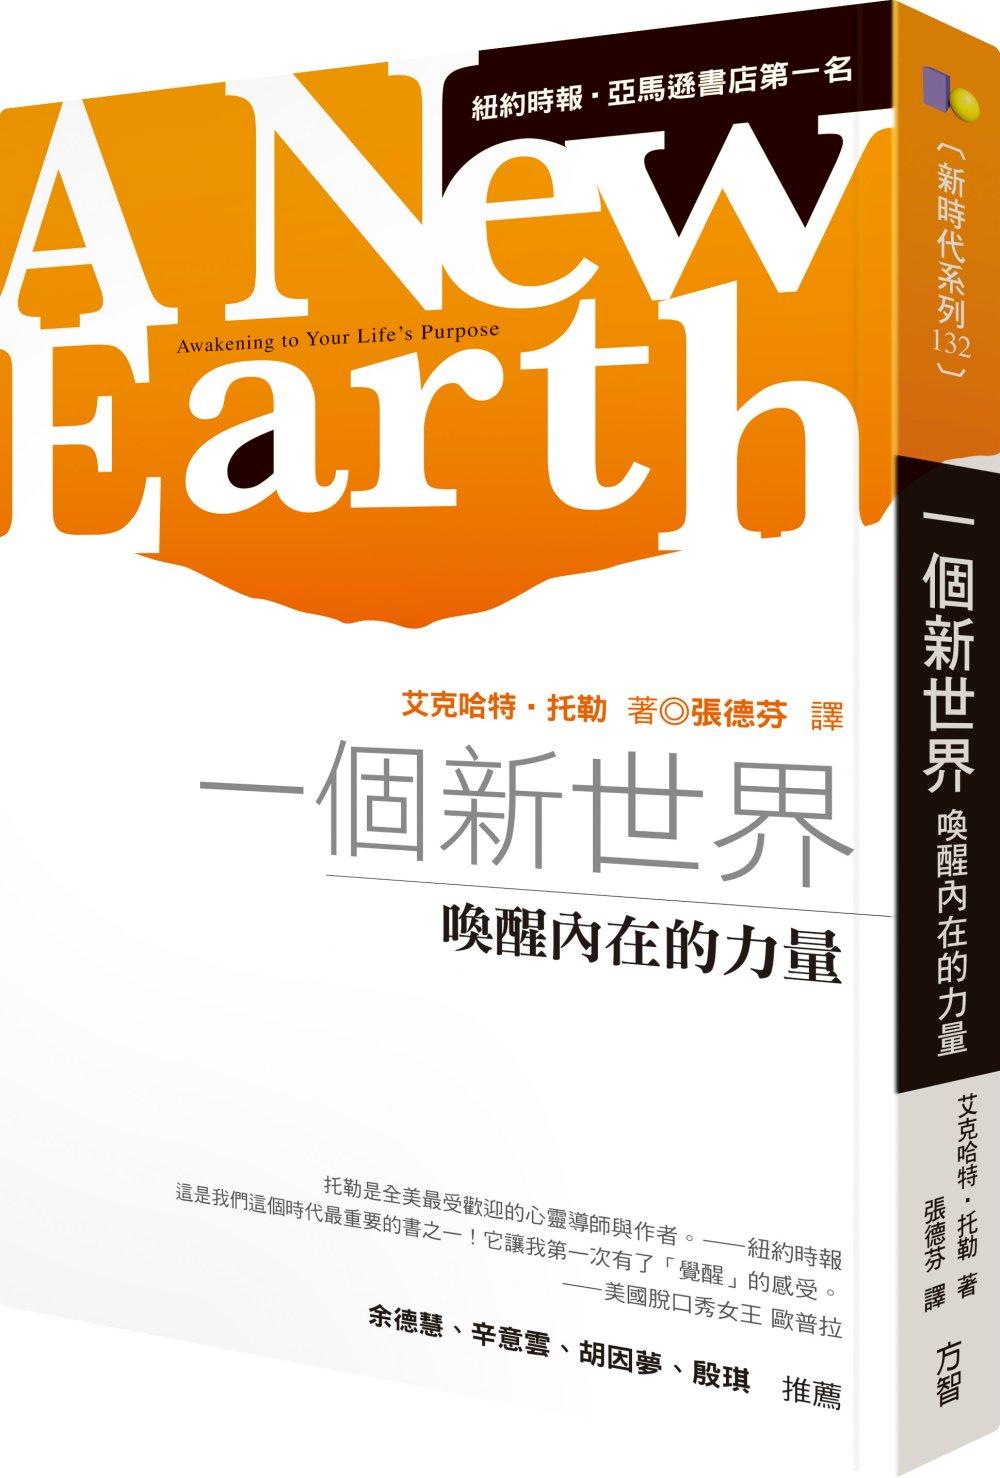 一個新世界 : 喚醒內在的力量 = A new earth : awakening to your life